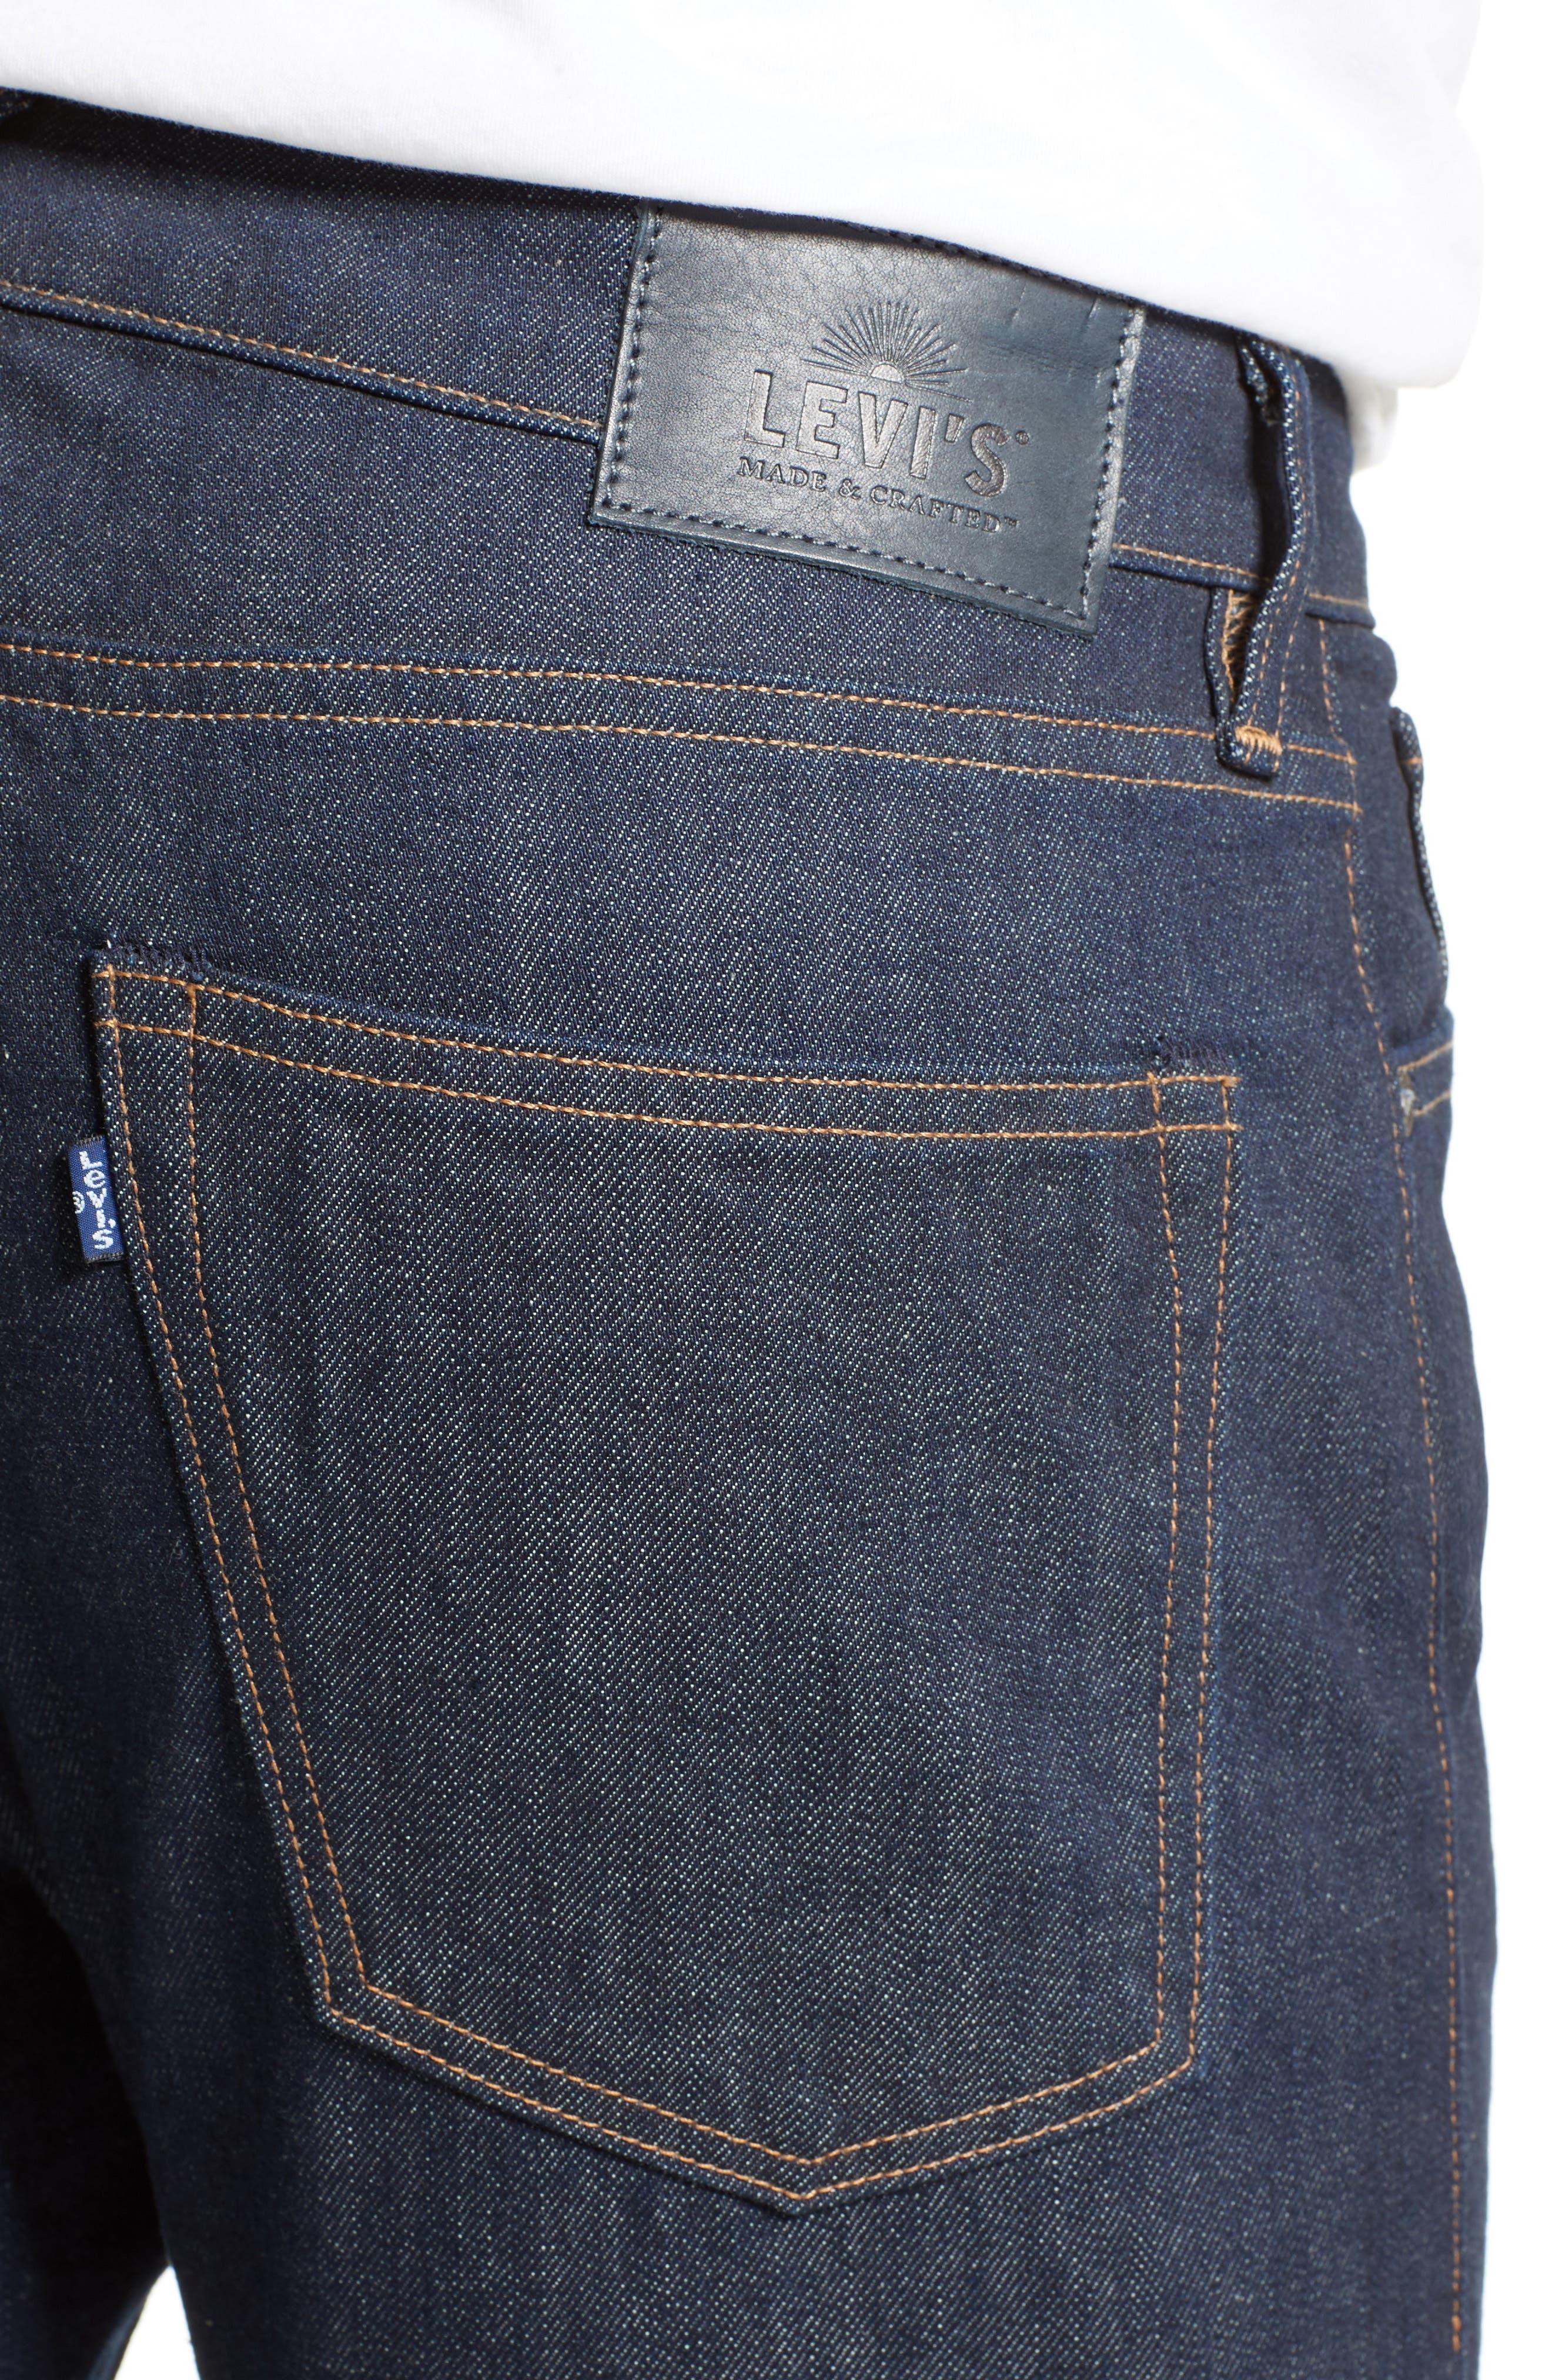 Tack Slim Fit Jeans,                             Alternate thumbnail 4, color,                             Dark Blue